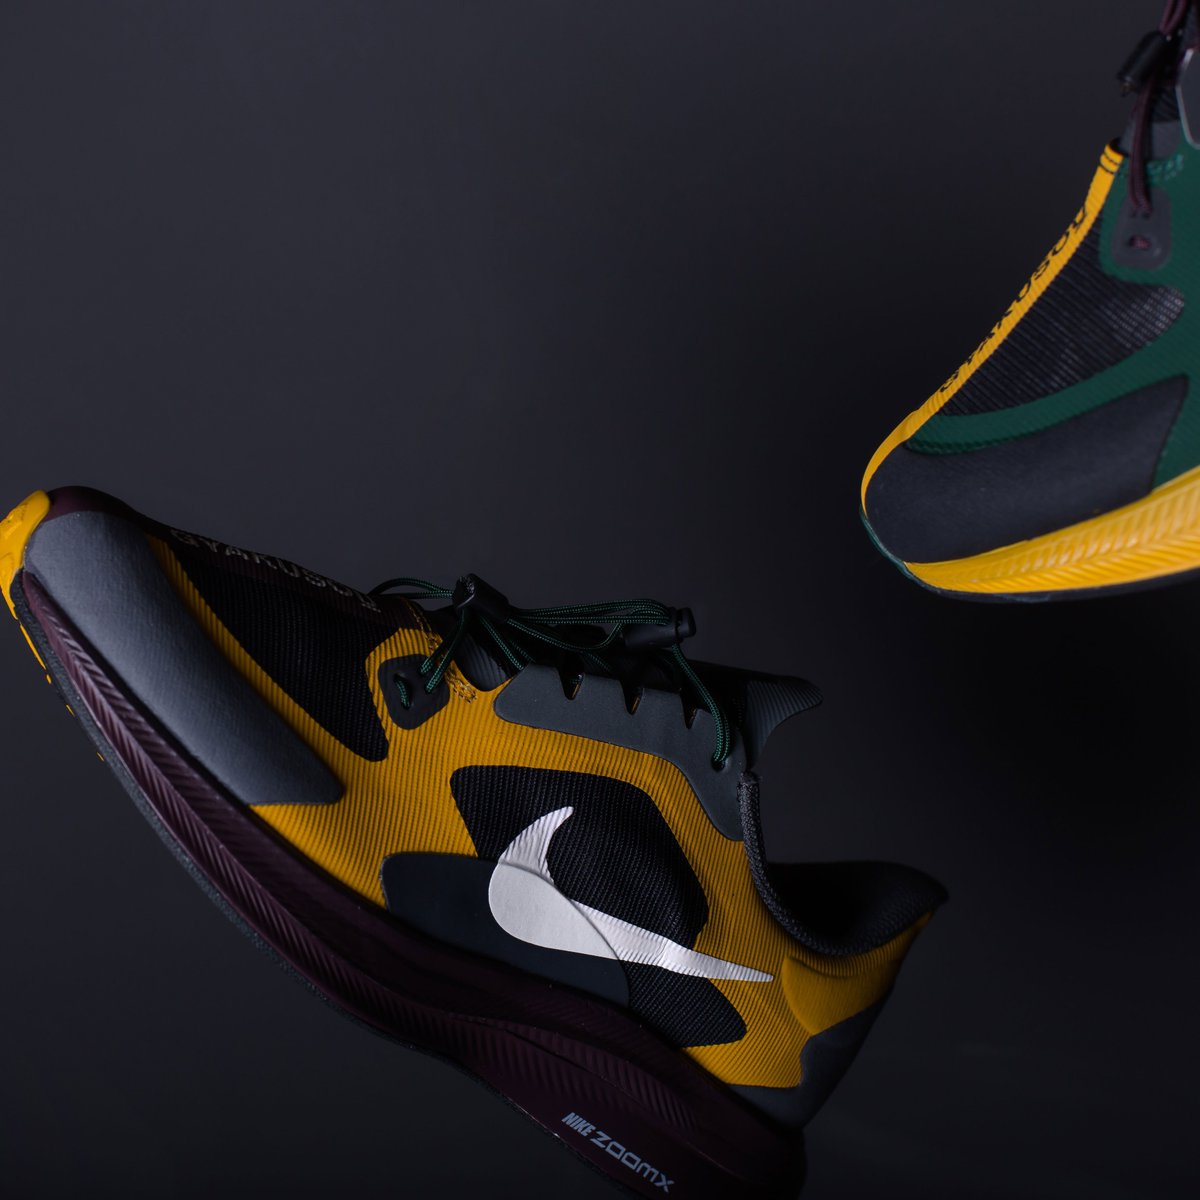 50ff51fca0 Nike Zoom Pegasus 35 Turbo Gyakusou is here now: http://ow.ly/ItzV30nSbMg # nike #gyakusou #footdistrictpic.twitter.com/P3vTGxyxIg